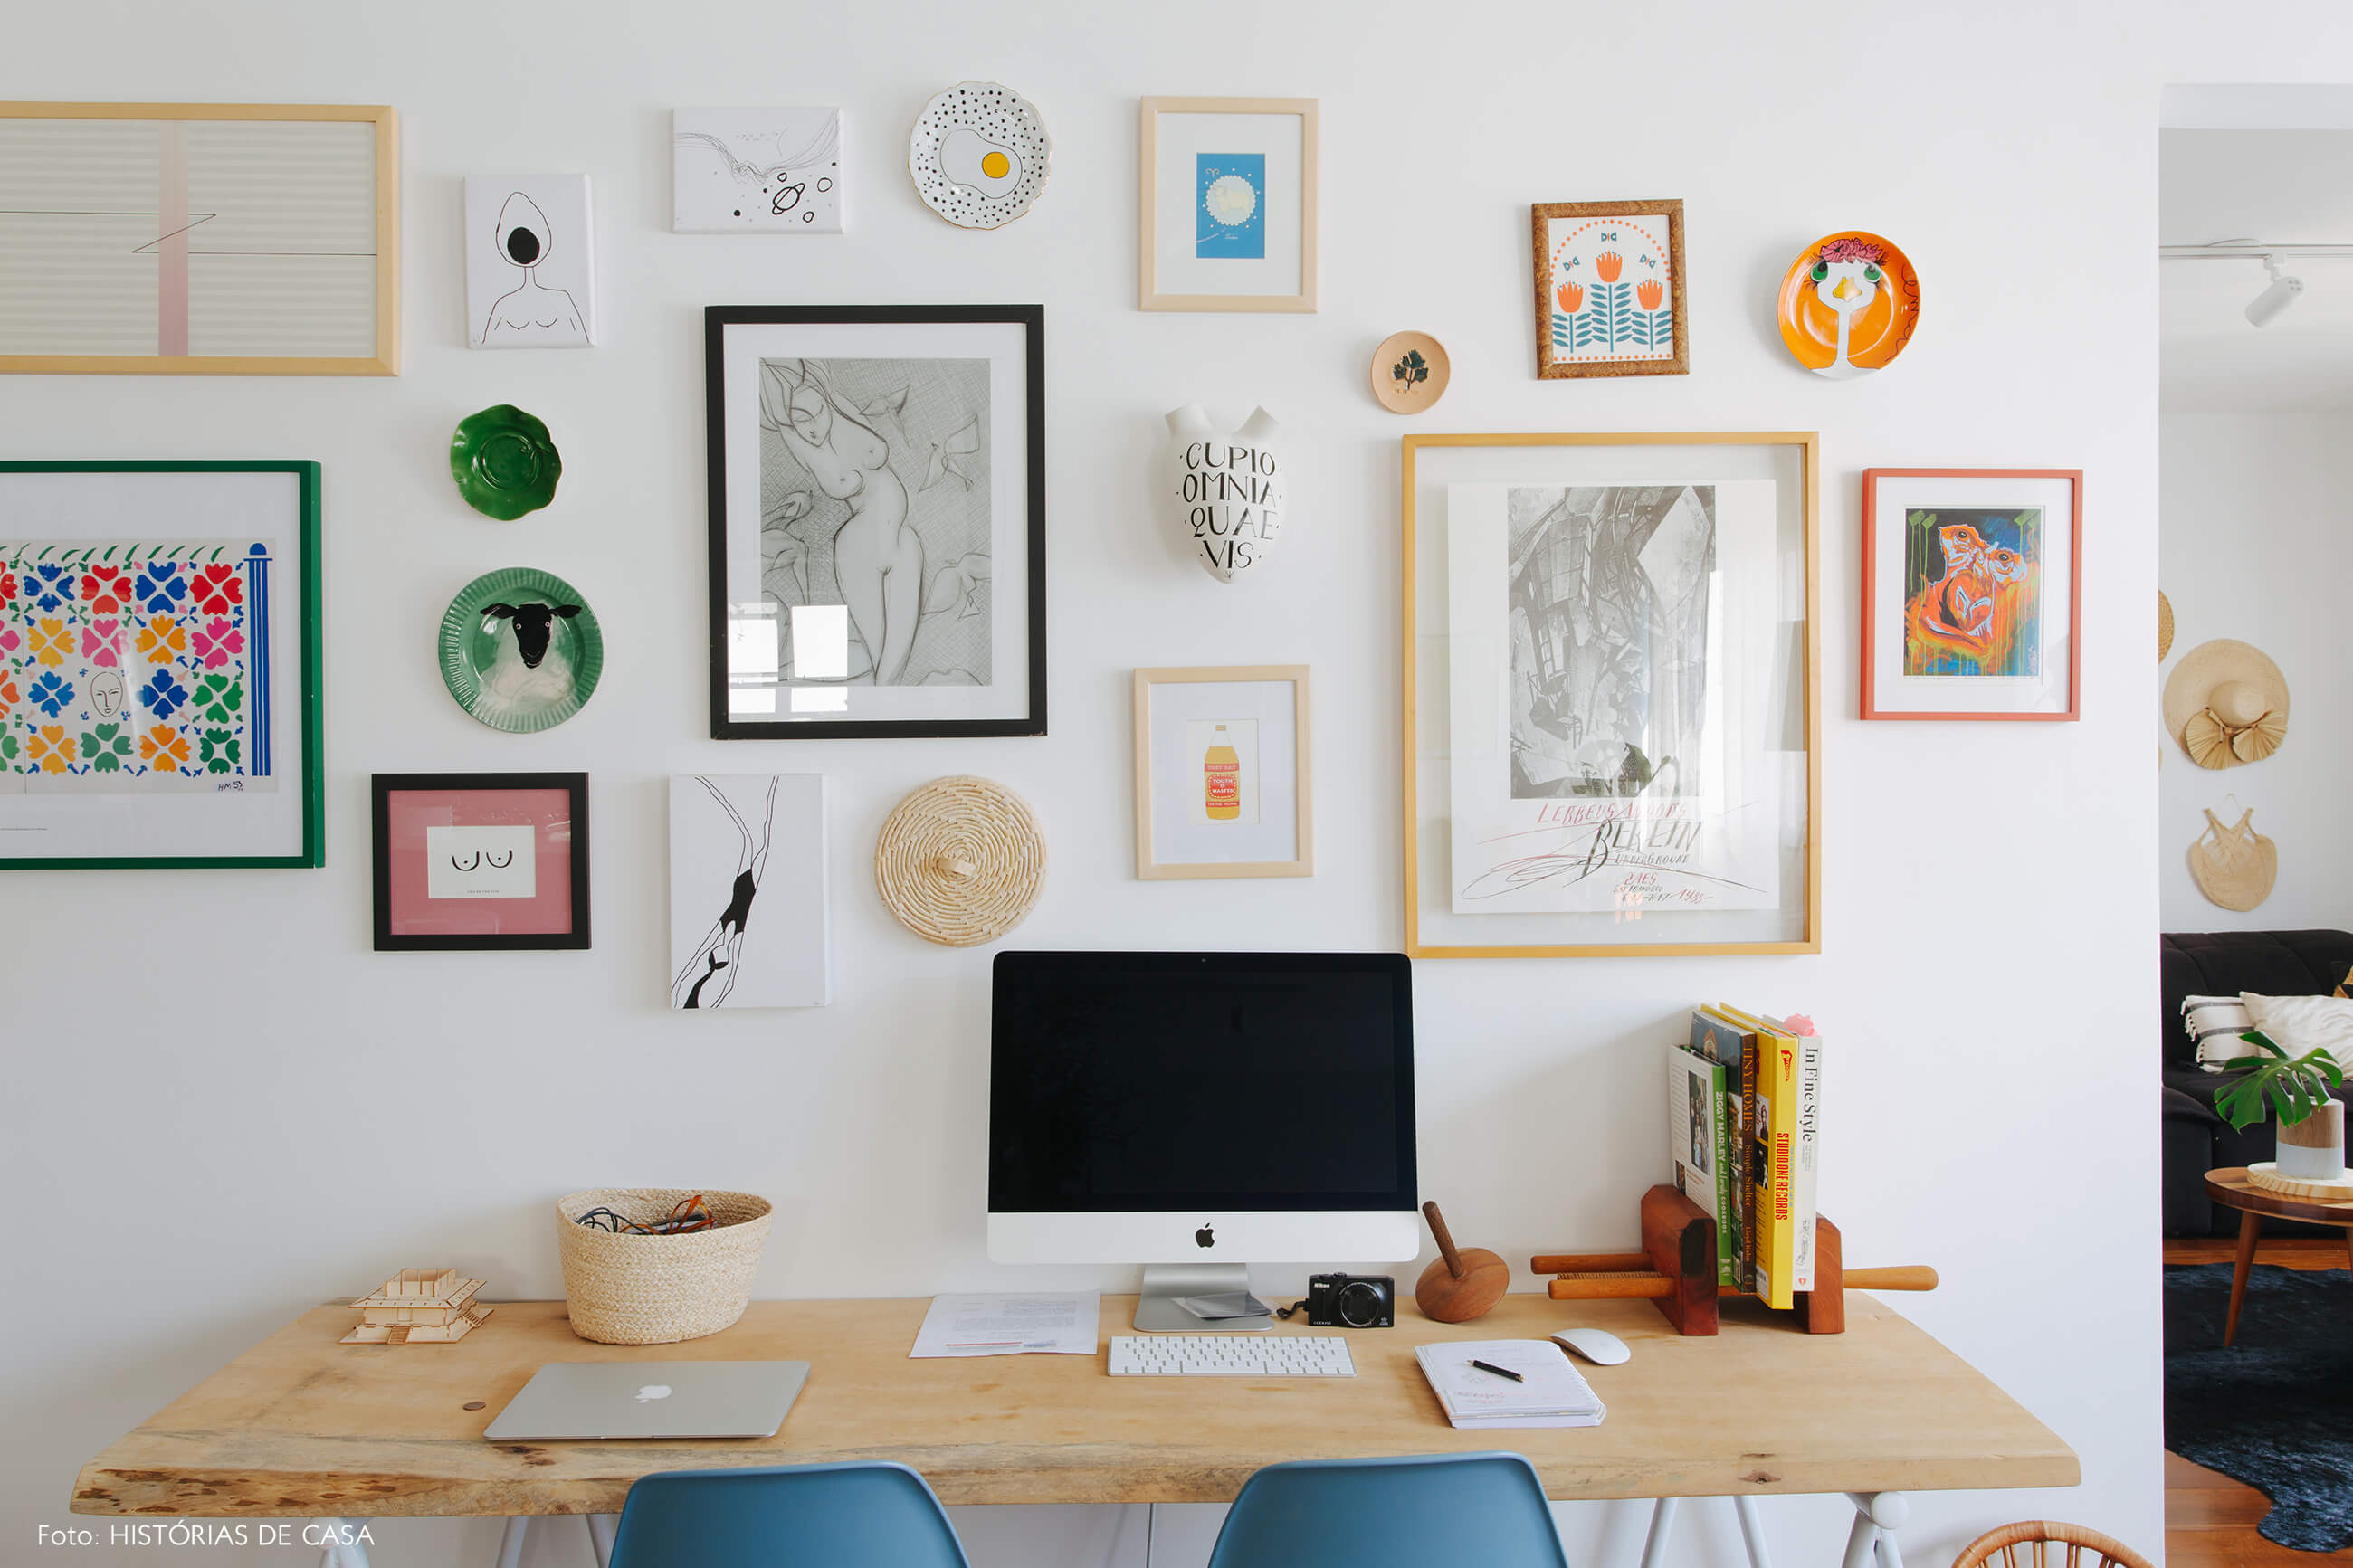 Apartamento chef Renata Vanzetto, home office na sala, parede de quadros